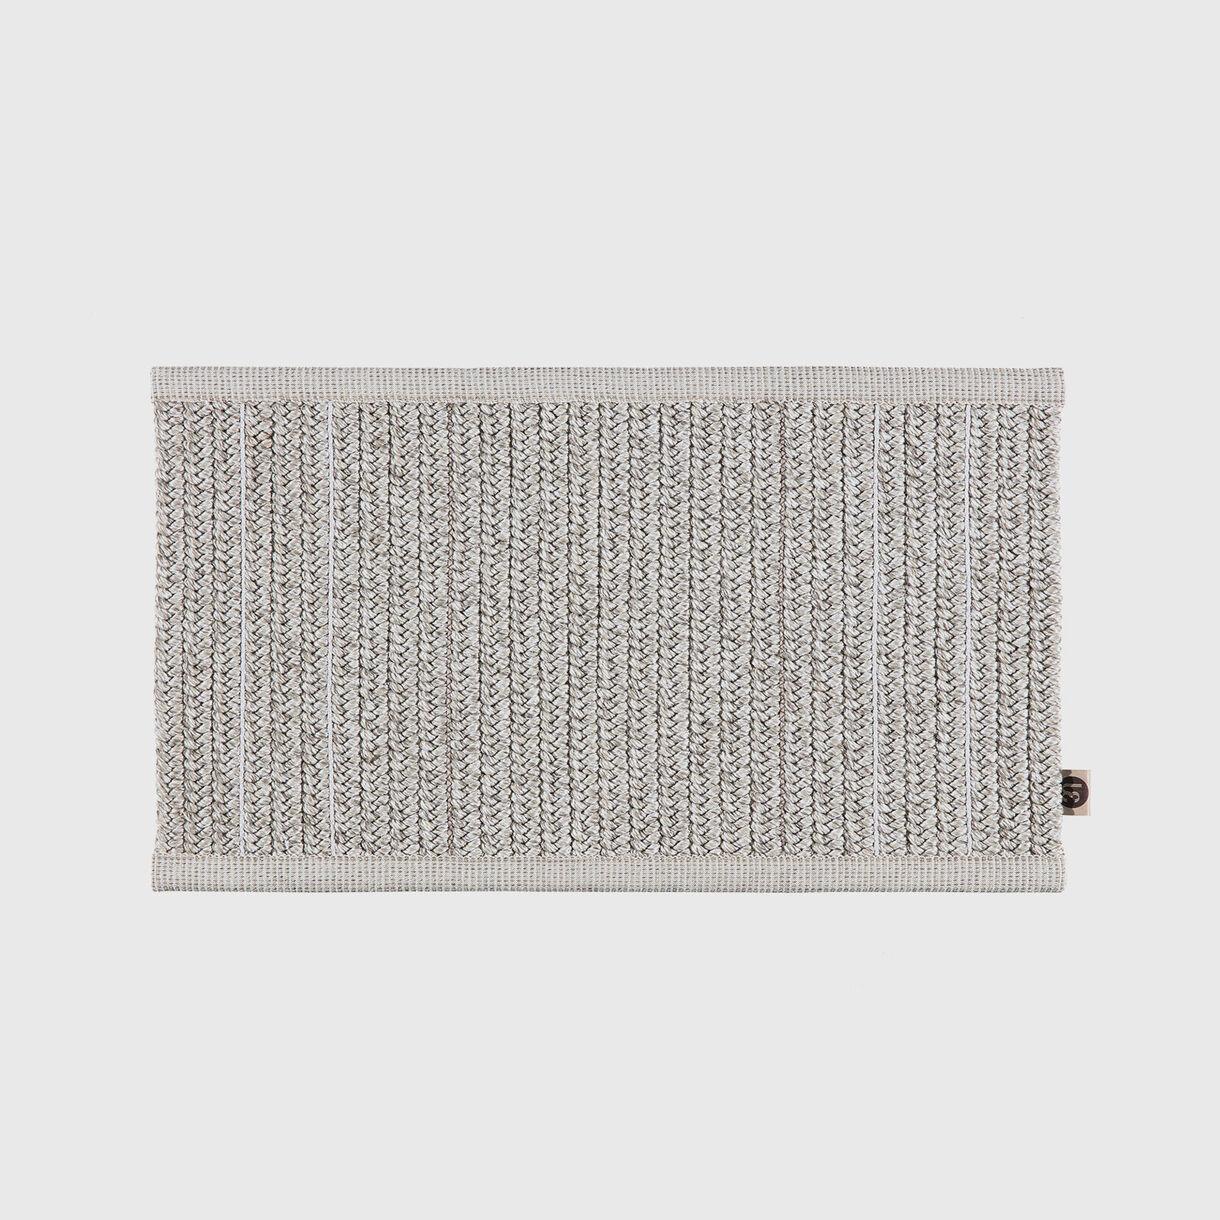 Patio Rug, White Dew - Sample